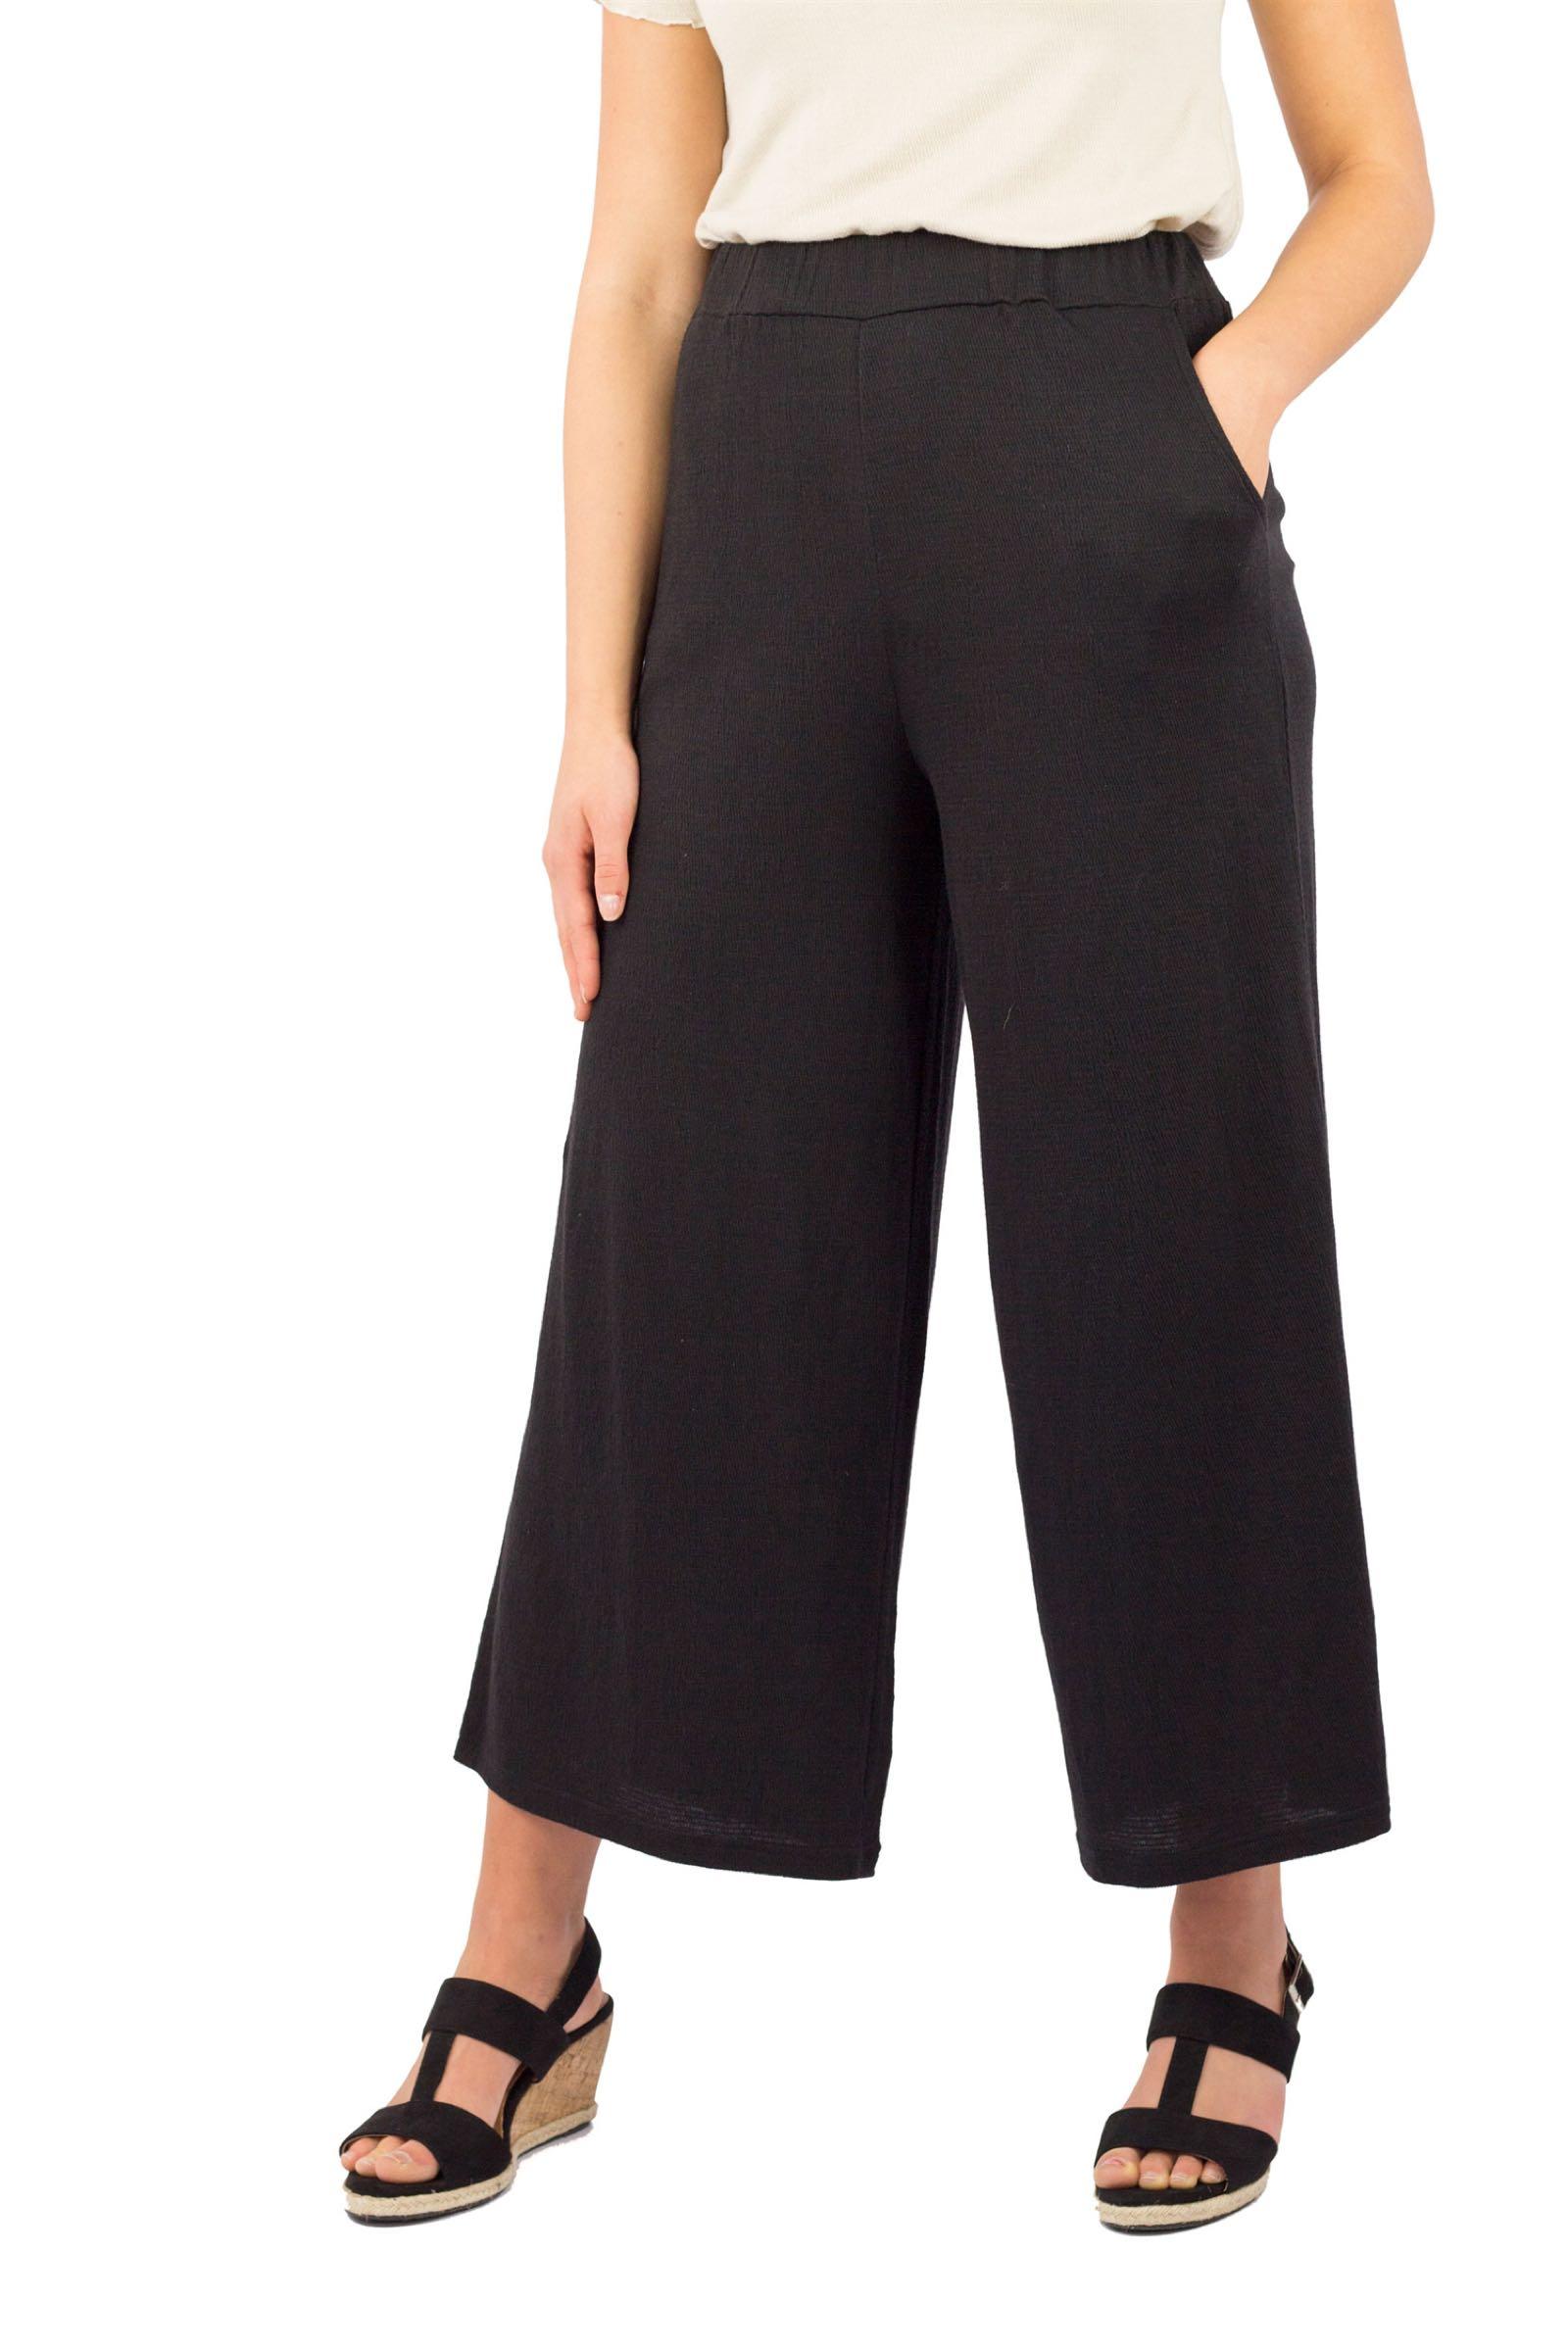 Neela pants